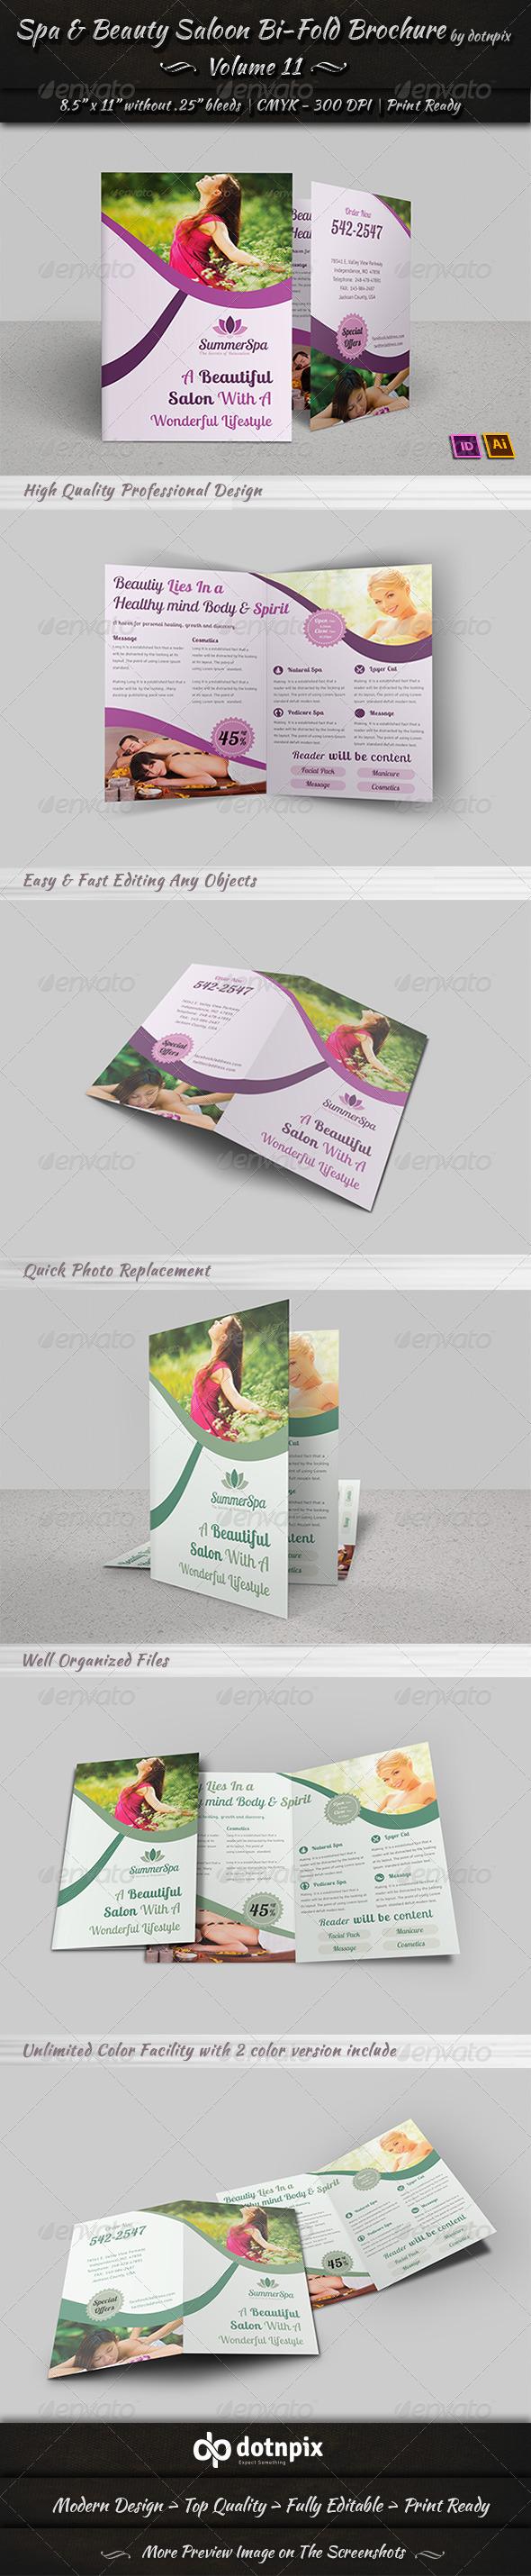 Spa & Beauty Saloon Bi-Fold Brochure| Volume 11 - Brochures Print Templates